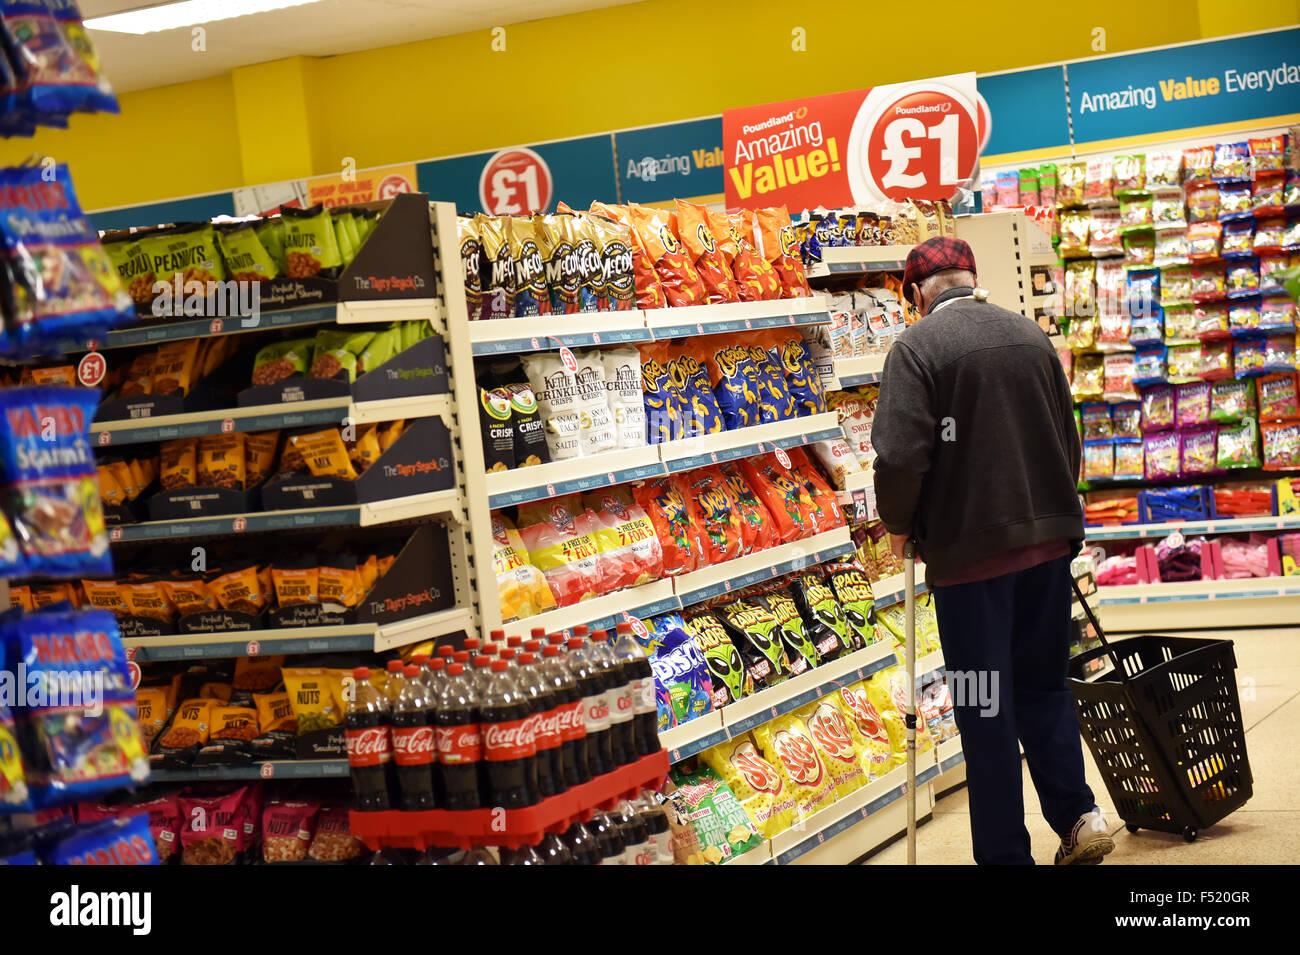 Un pensionista tiendas en un almacén Poundland UK Imagen De Stock